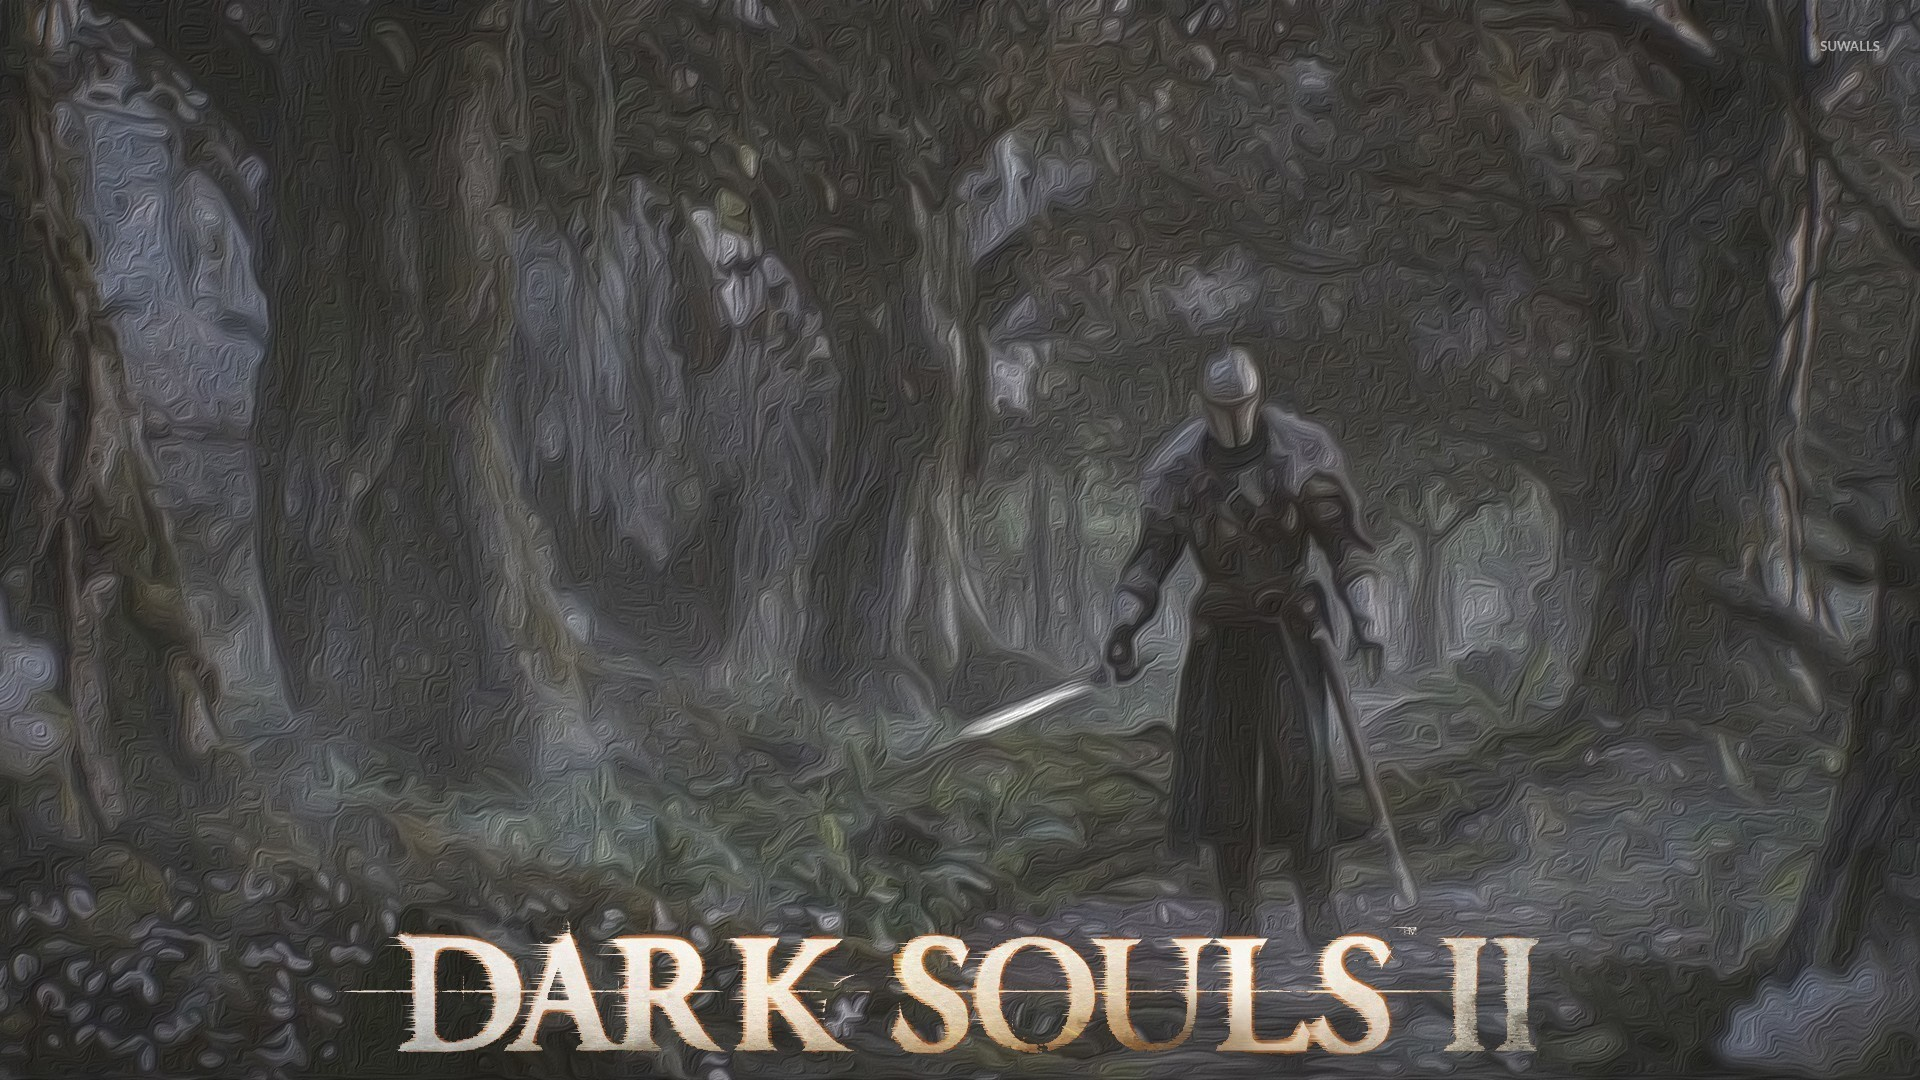 Dark Souls 2 Wallpaper: Dark Souls II [7] Wallpaper